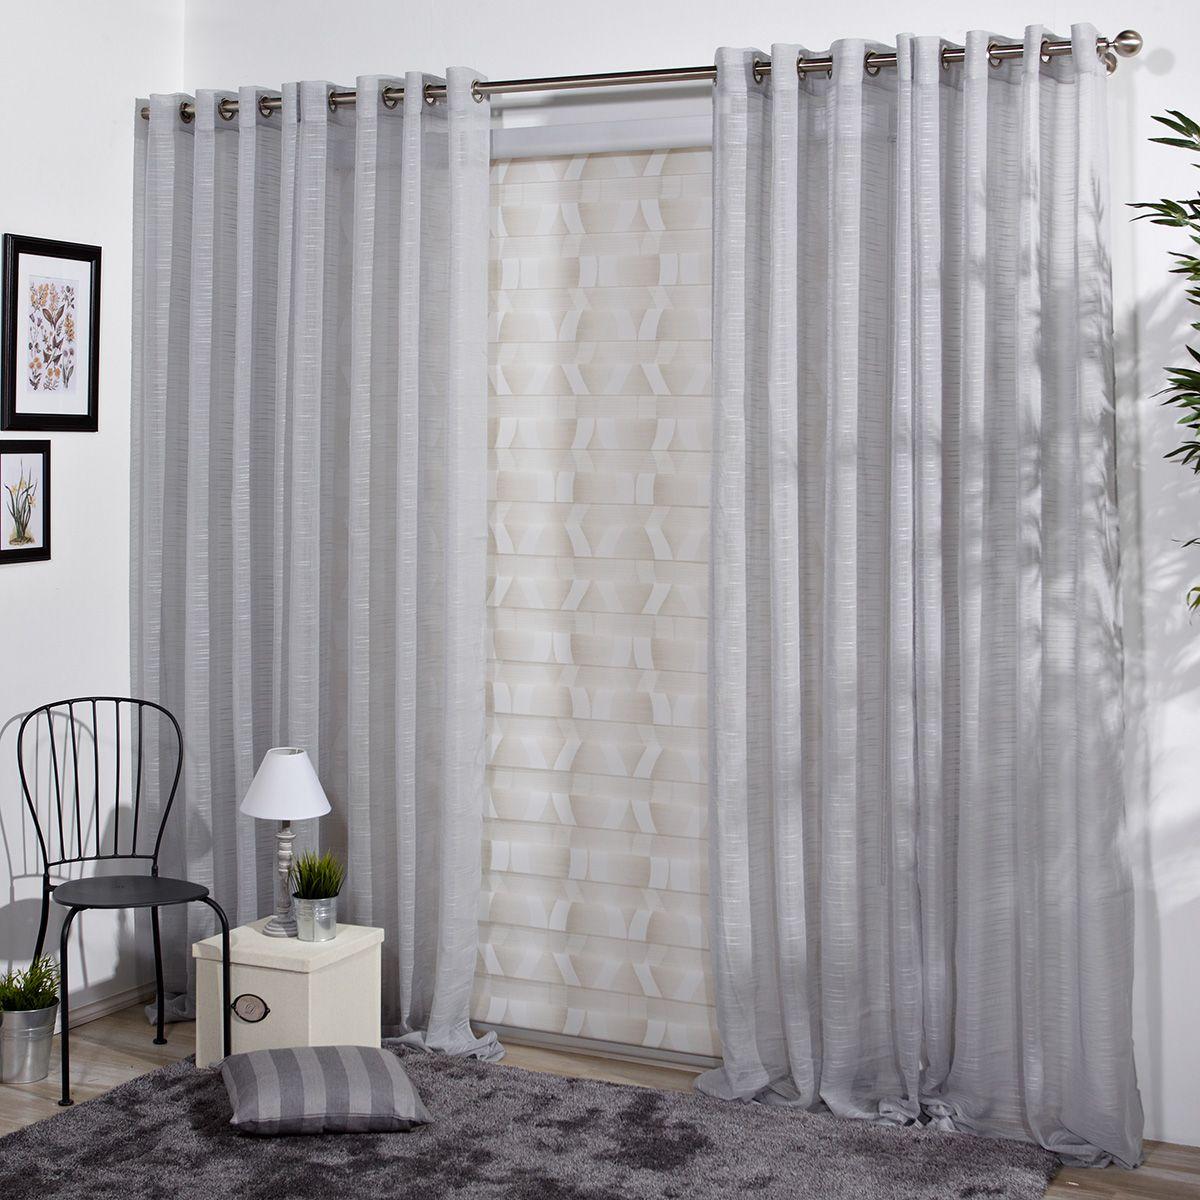 Visillo decorativo abian gris for Cortinas grises